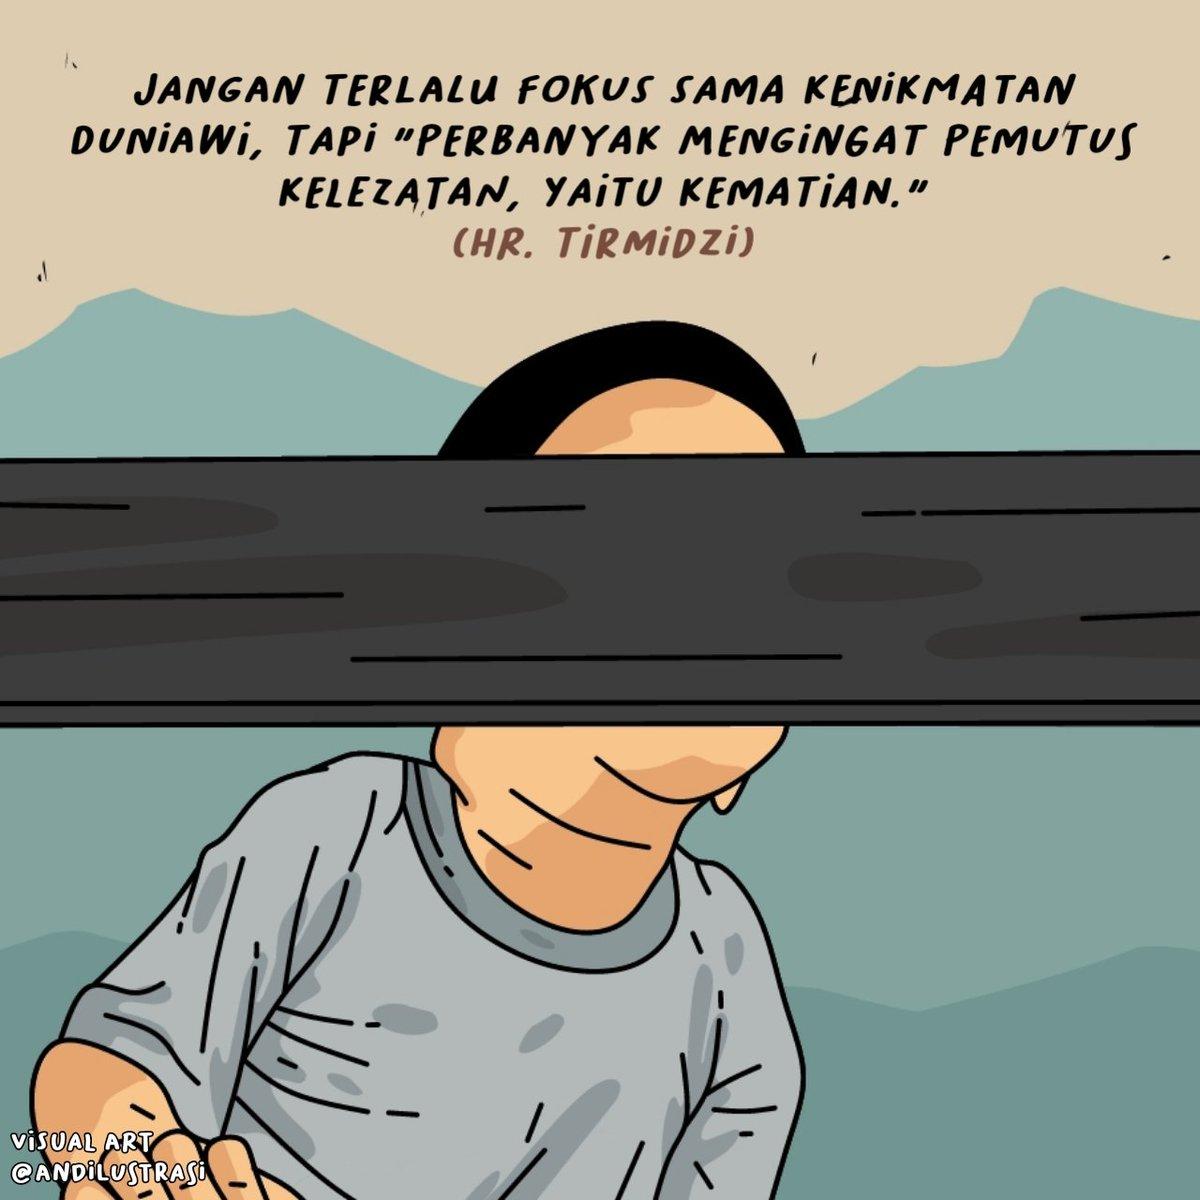 🥀 . . . #andilustrasi #illustration #seniman #art #masakecil #generasi90an #gambarkartun #karyavisual #kartunmuslimah #masakecilbahagia #selalubersyukur #vectorart #ilustrasikartun #ilustrasi #kartundakwah #quoteindonesia #quoteindo #senimankata #senimanindonesia